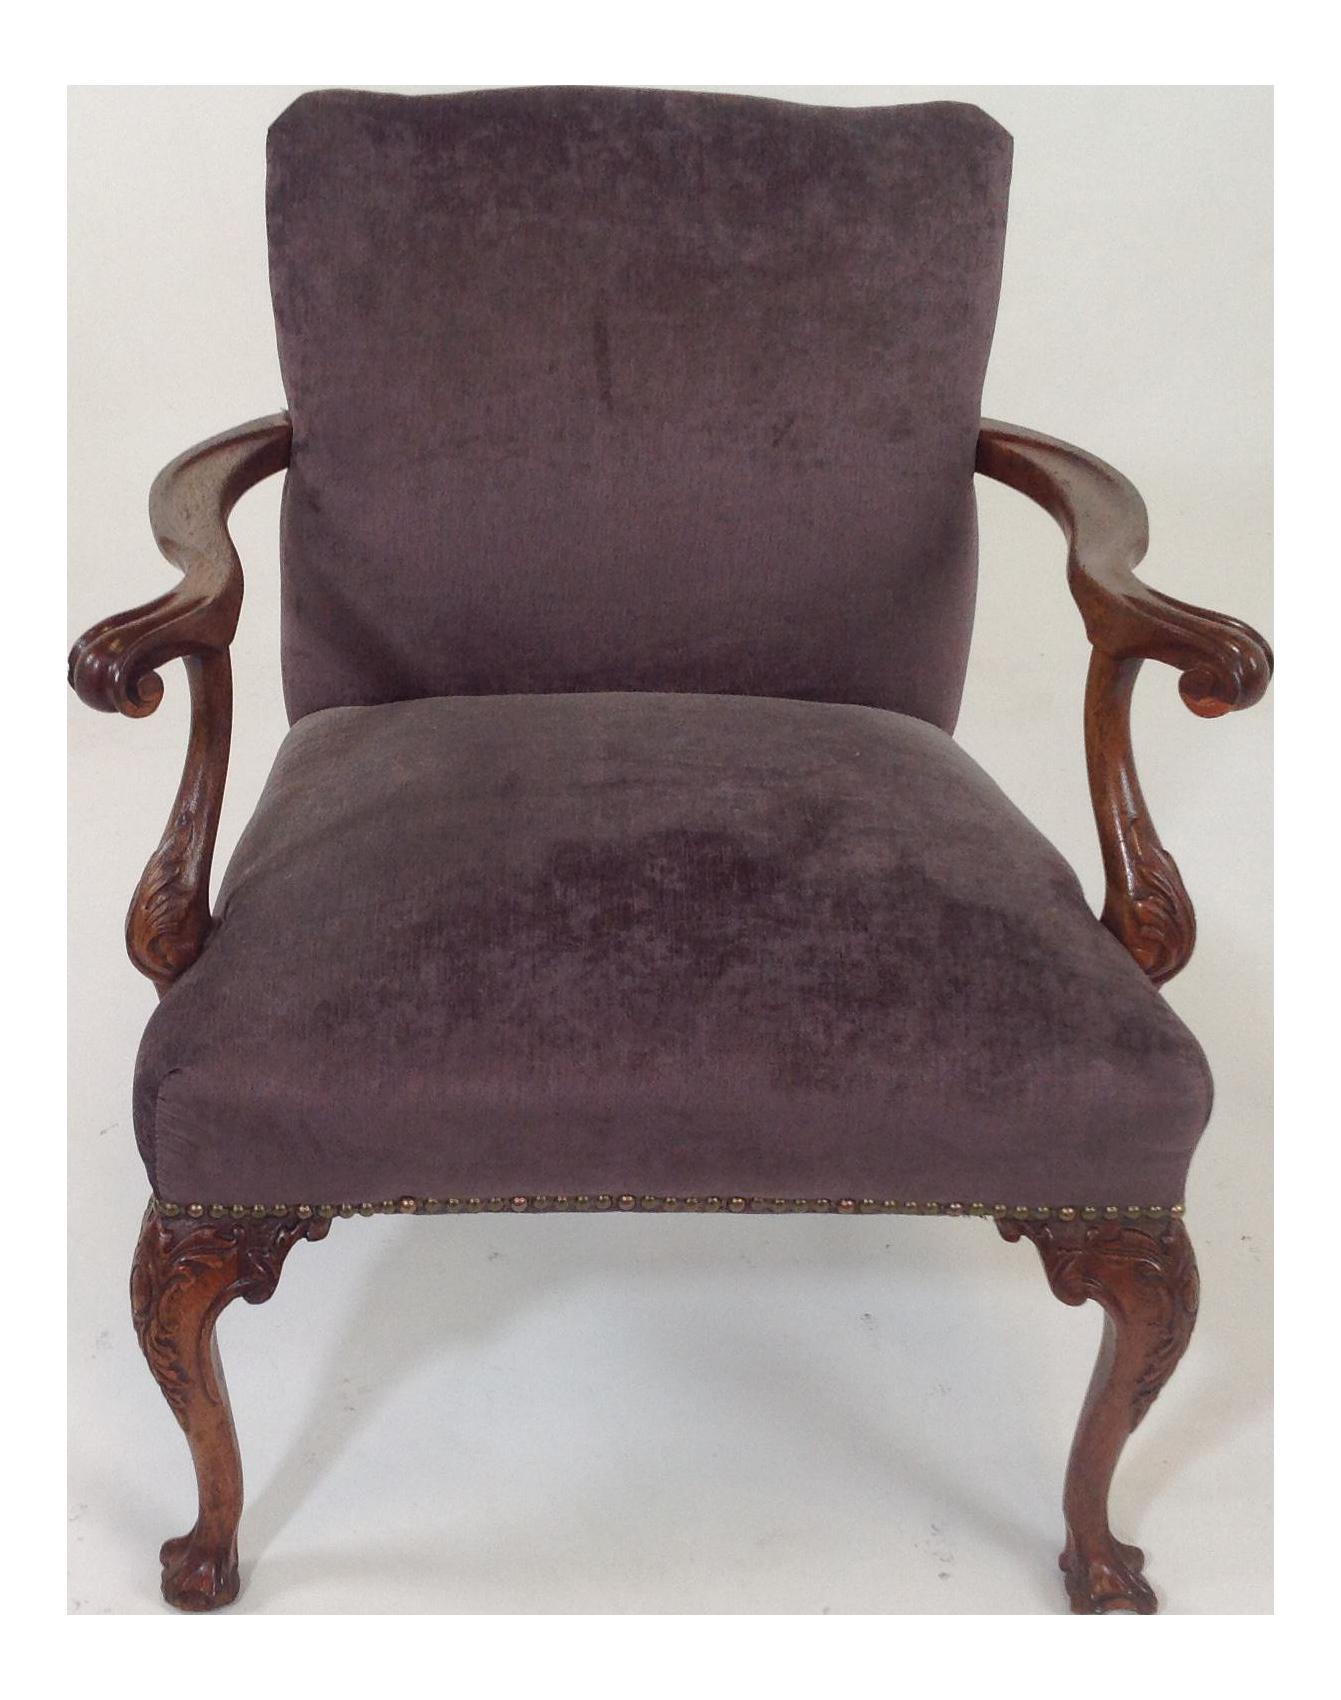 Purple velvet chair - Image Of Antique Purple Velvet Claw Foot Chair